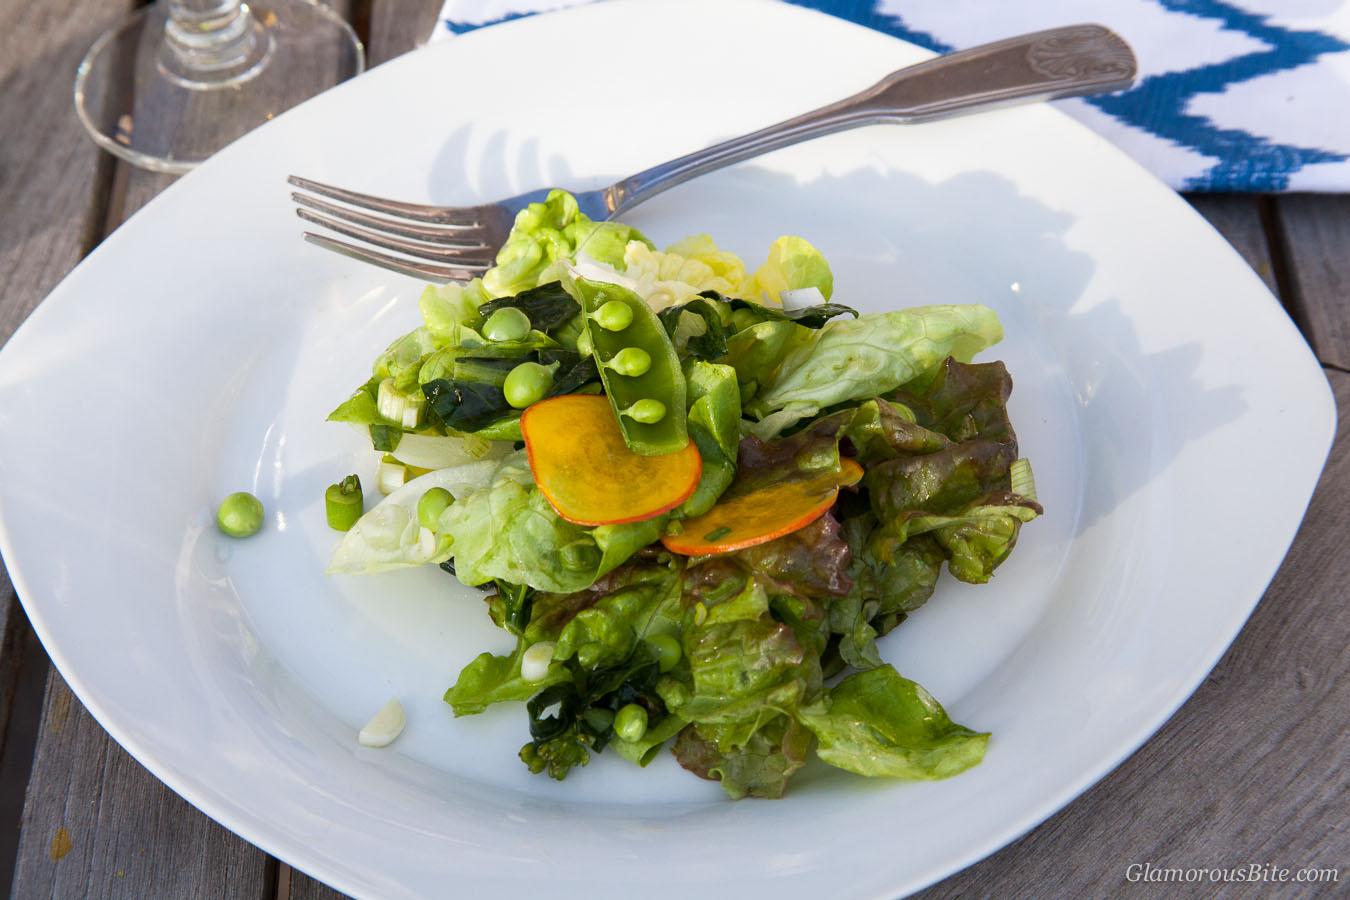 Salad Recipe Snap Peas